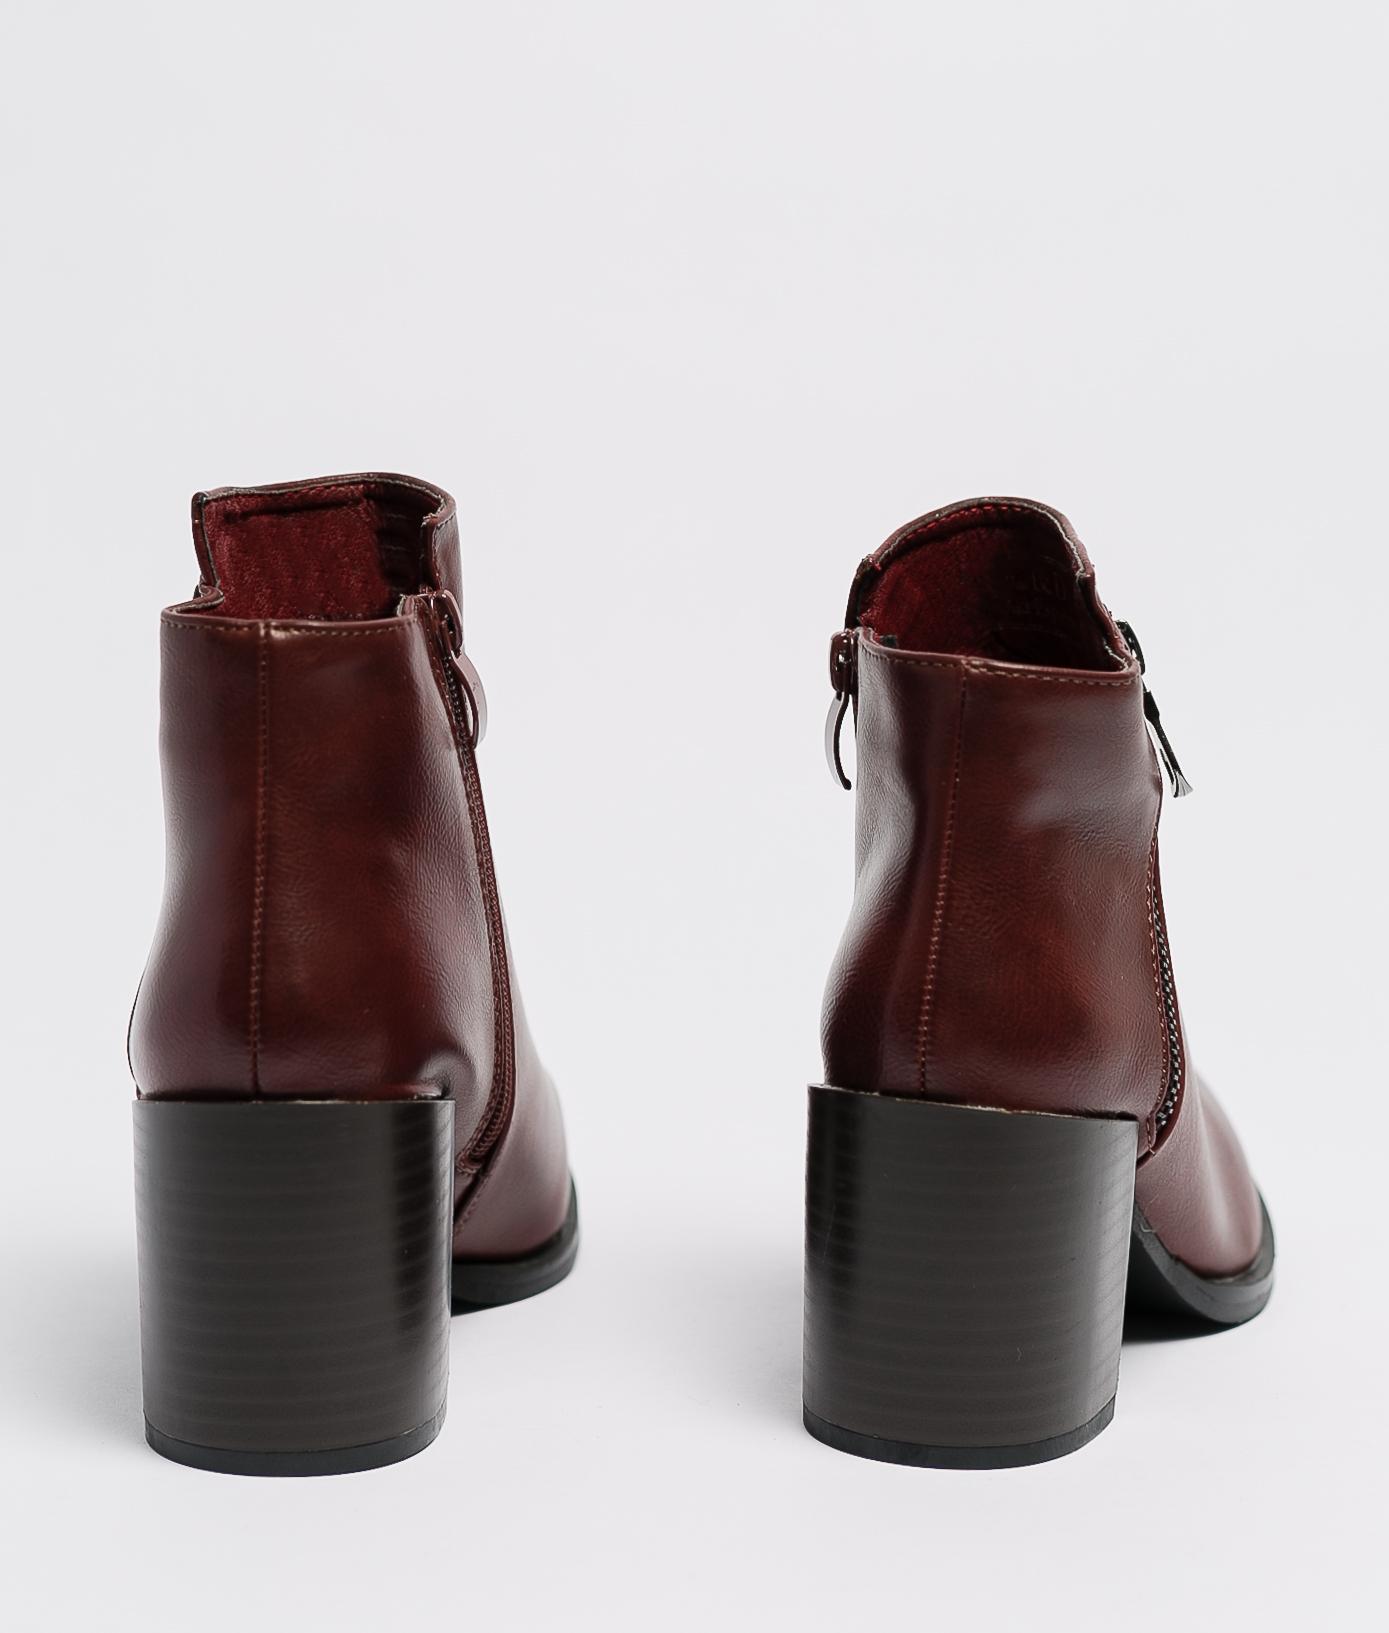 Boot Petite Trica - Grenat